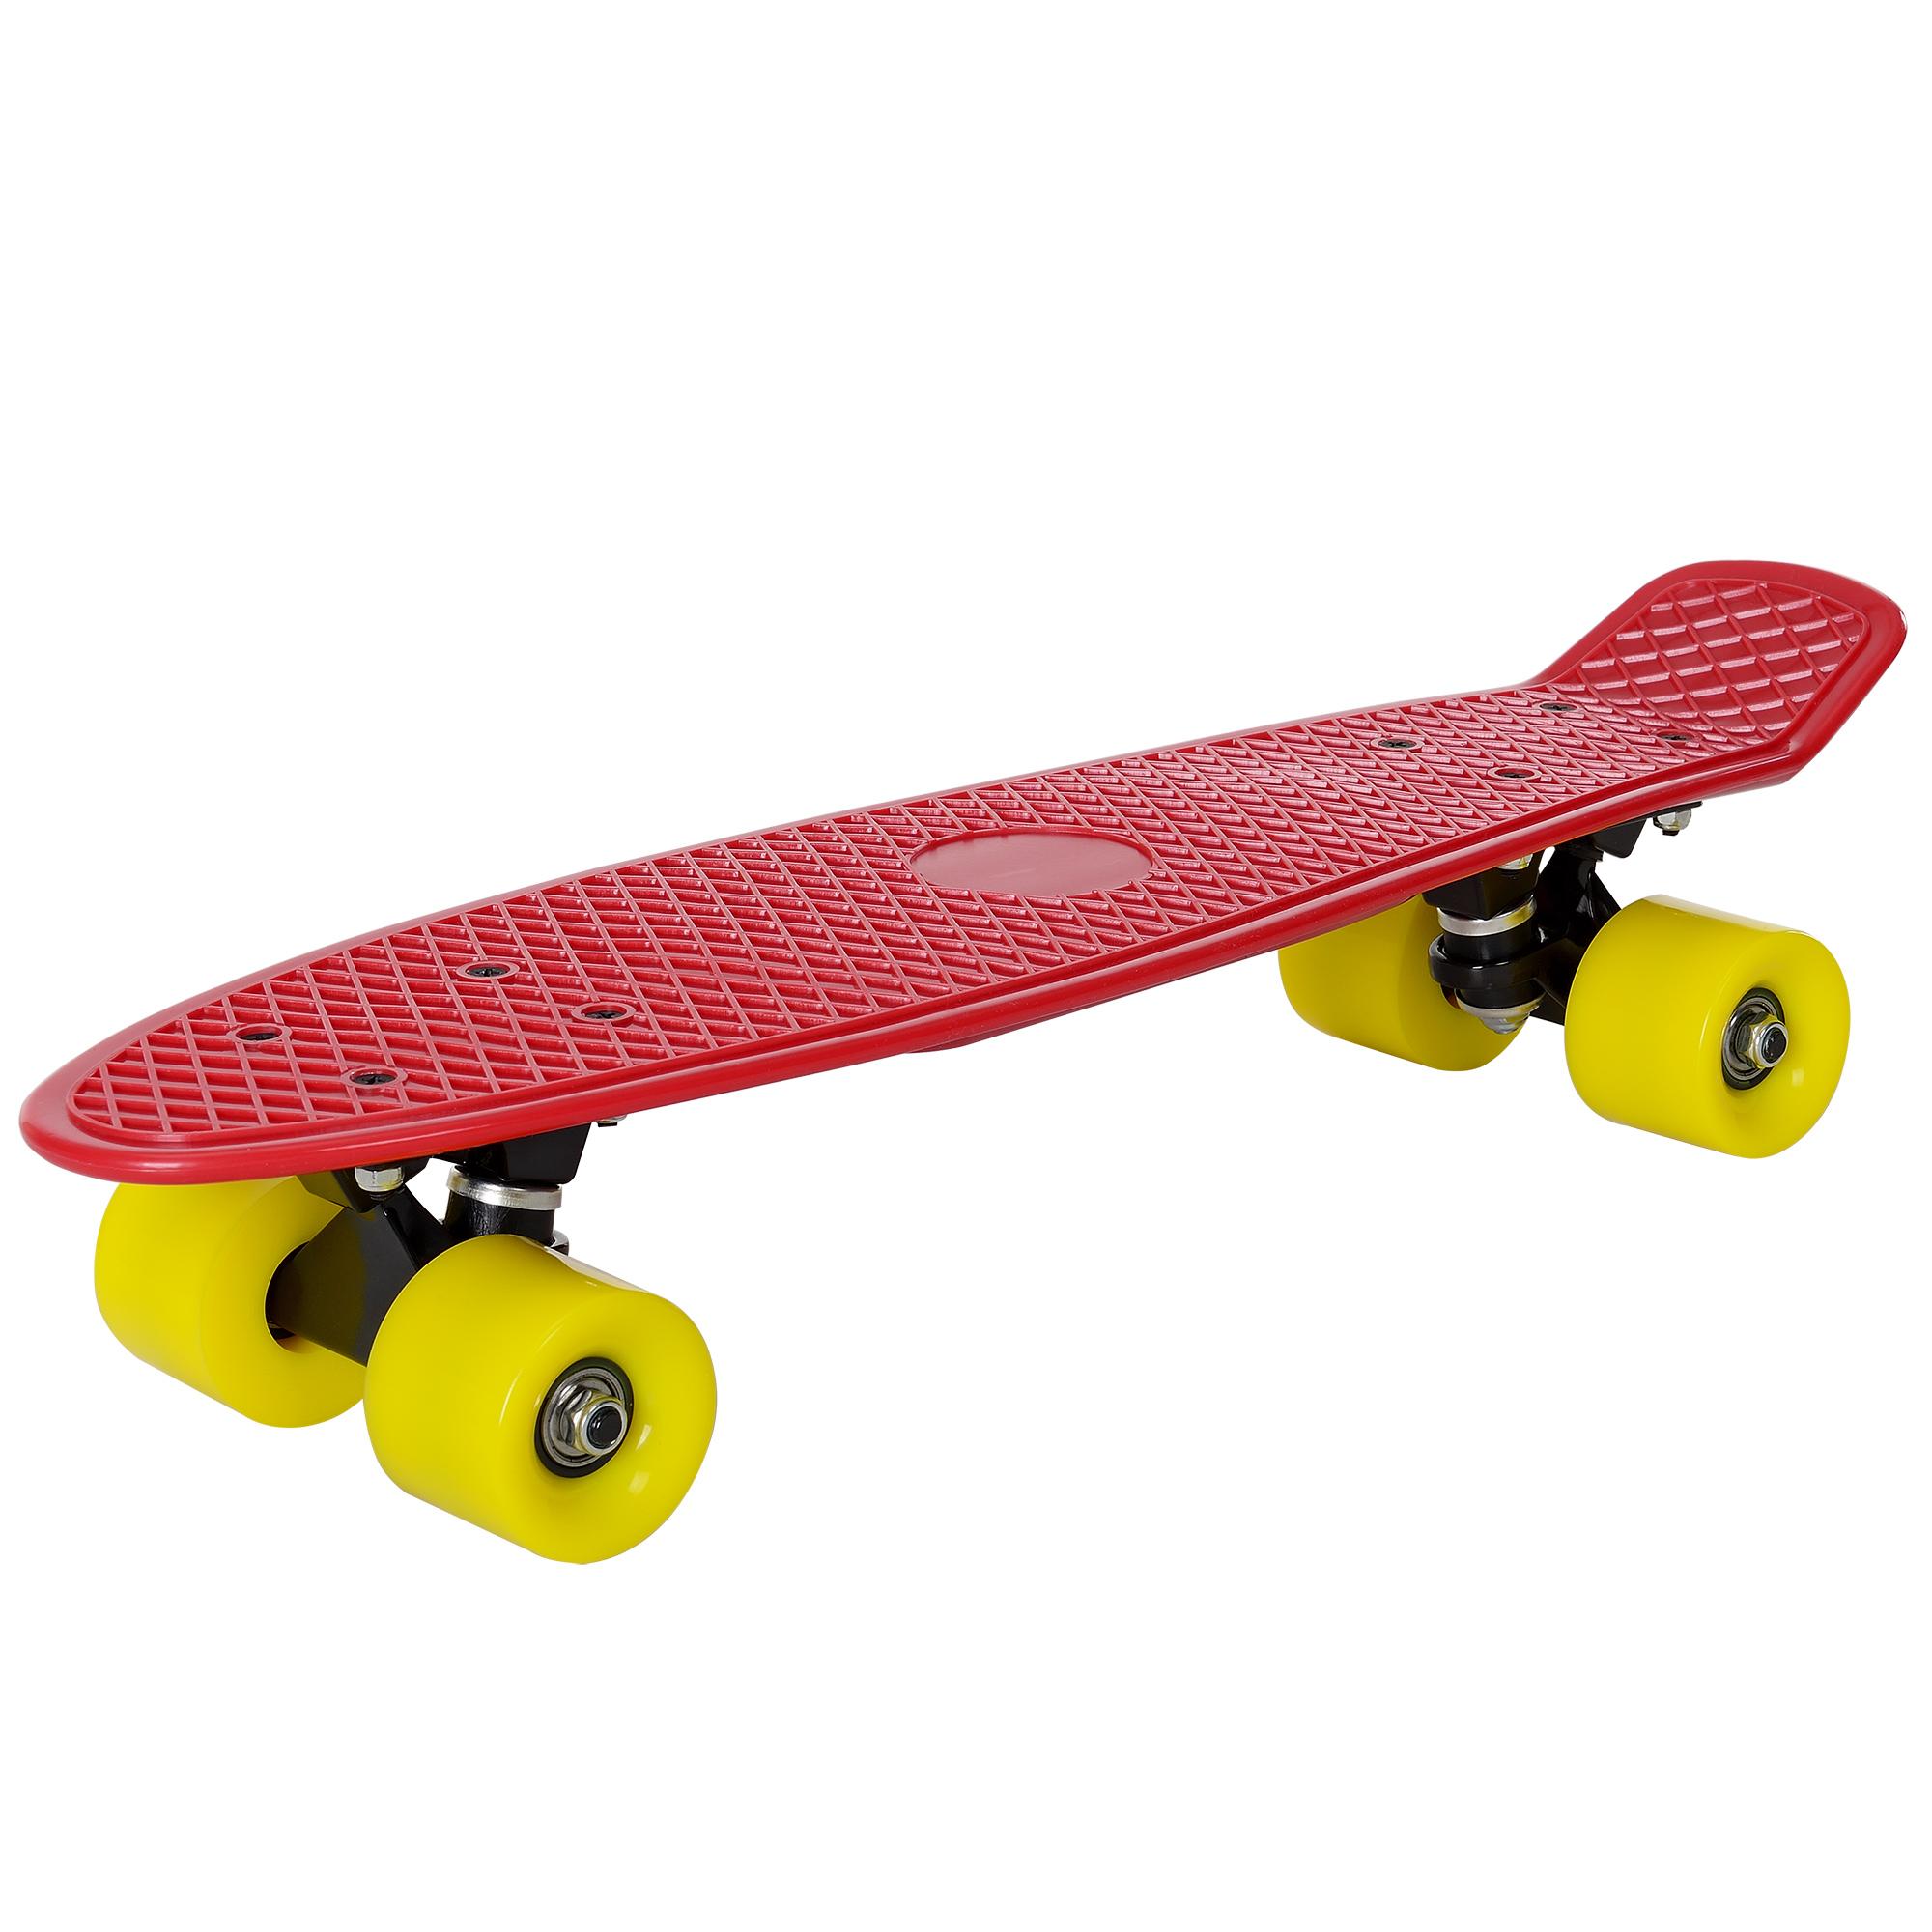 protec longboard retro old skateboard komplett street. Black Bedroom Furniture Sets. Home Design Ideas